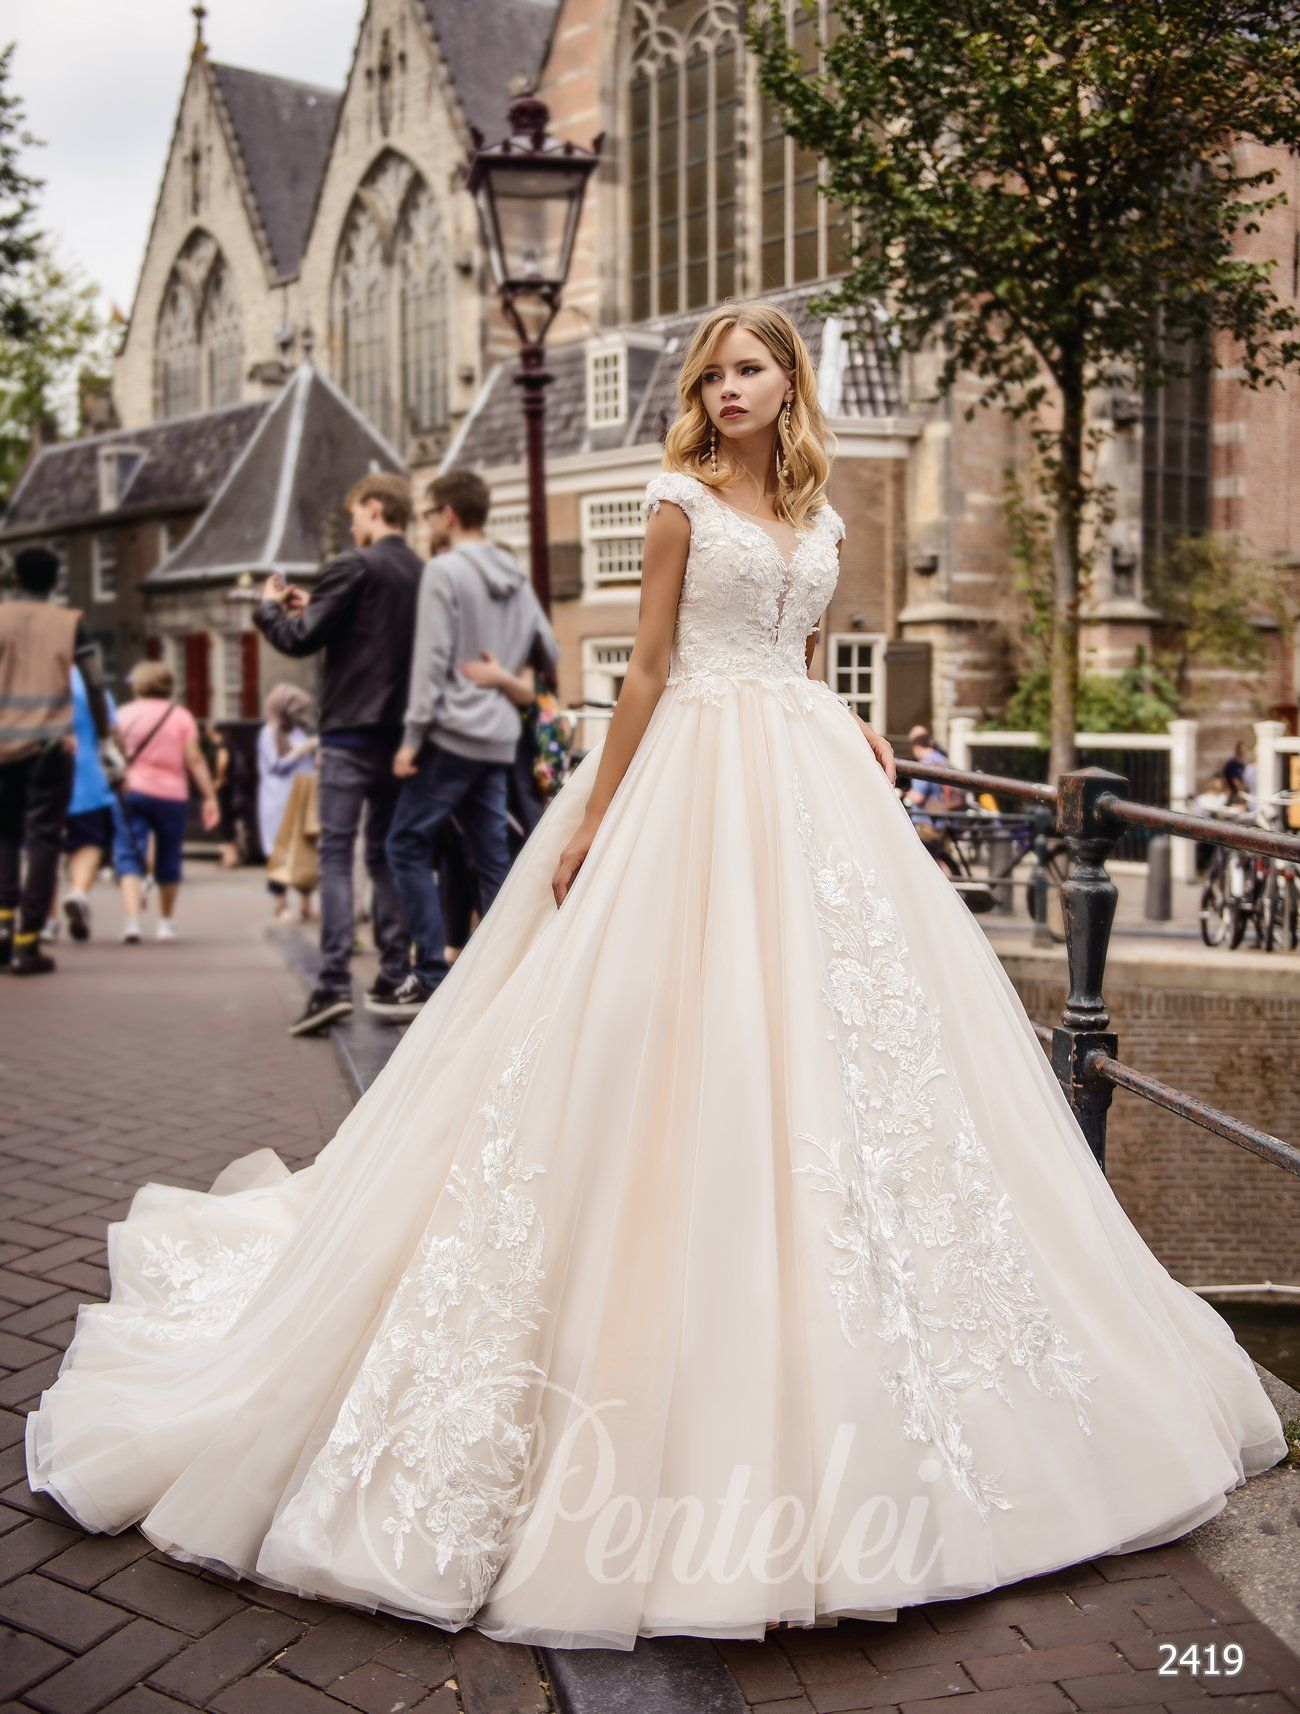 2419 Buy Wholesale Wedding Dresses From Pentelei: Ever Buying Wholesale Wedding Dresses At Reisefeber.org